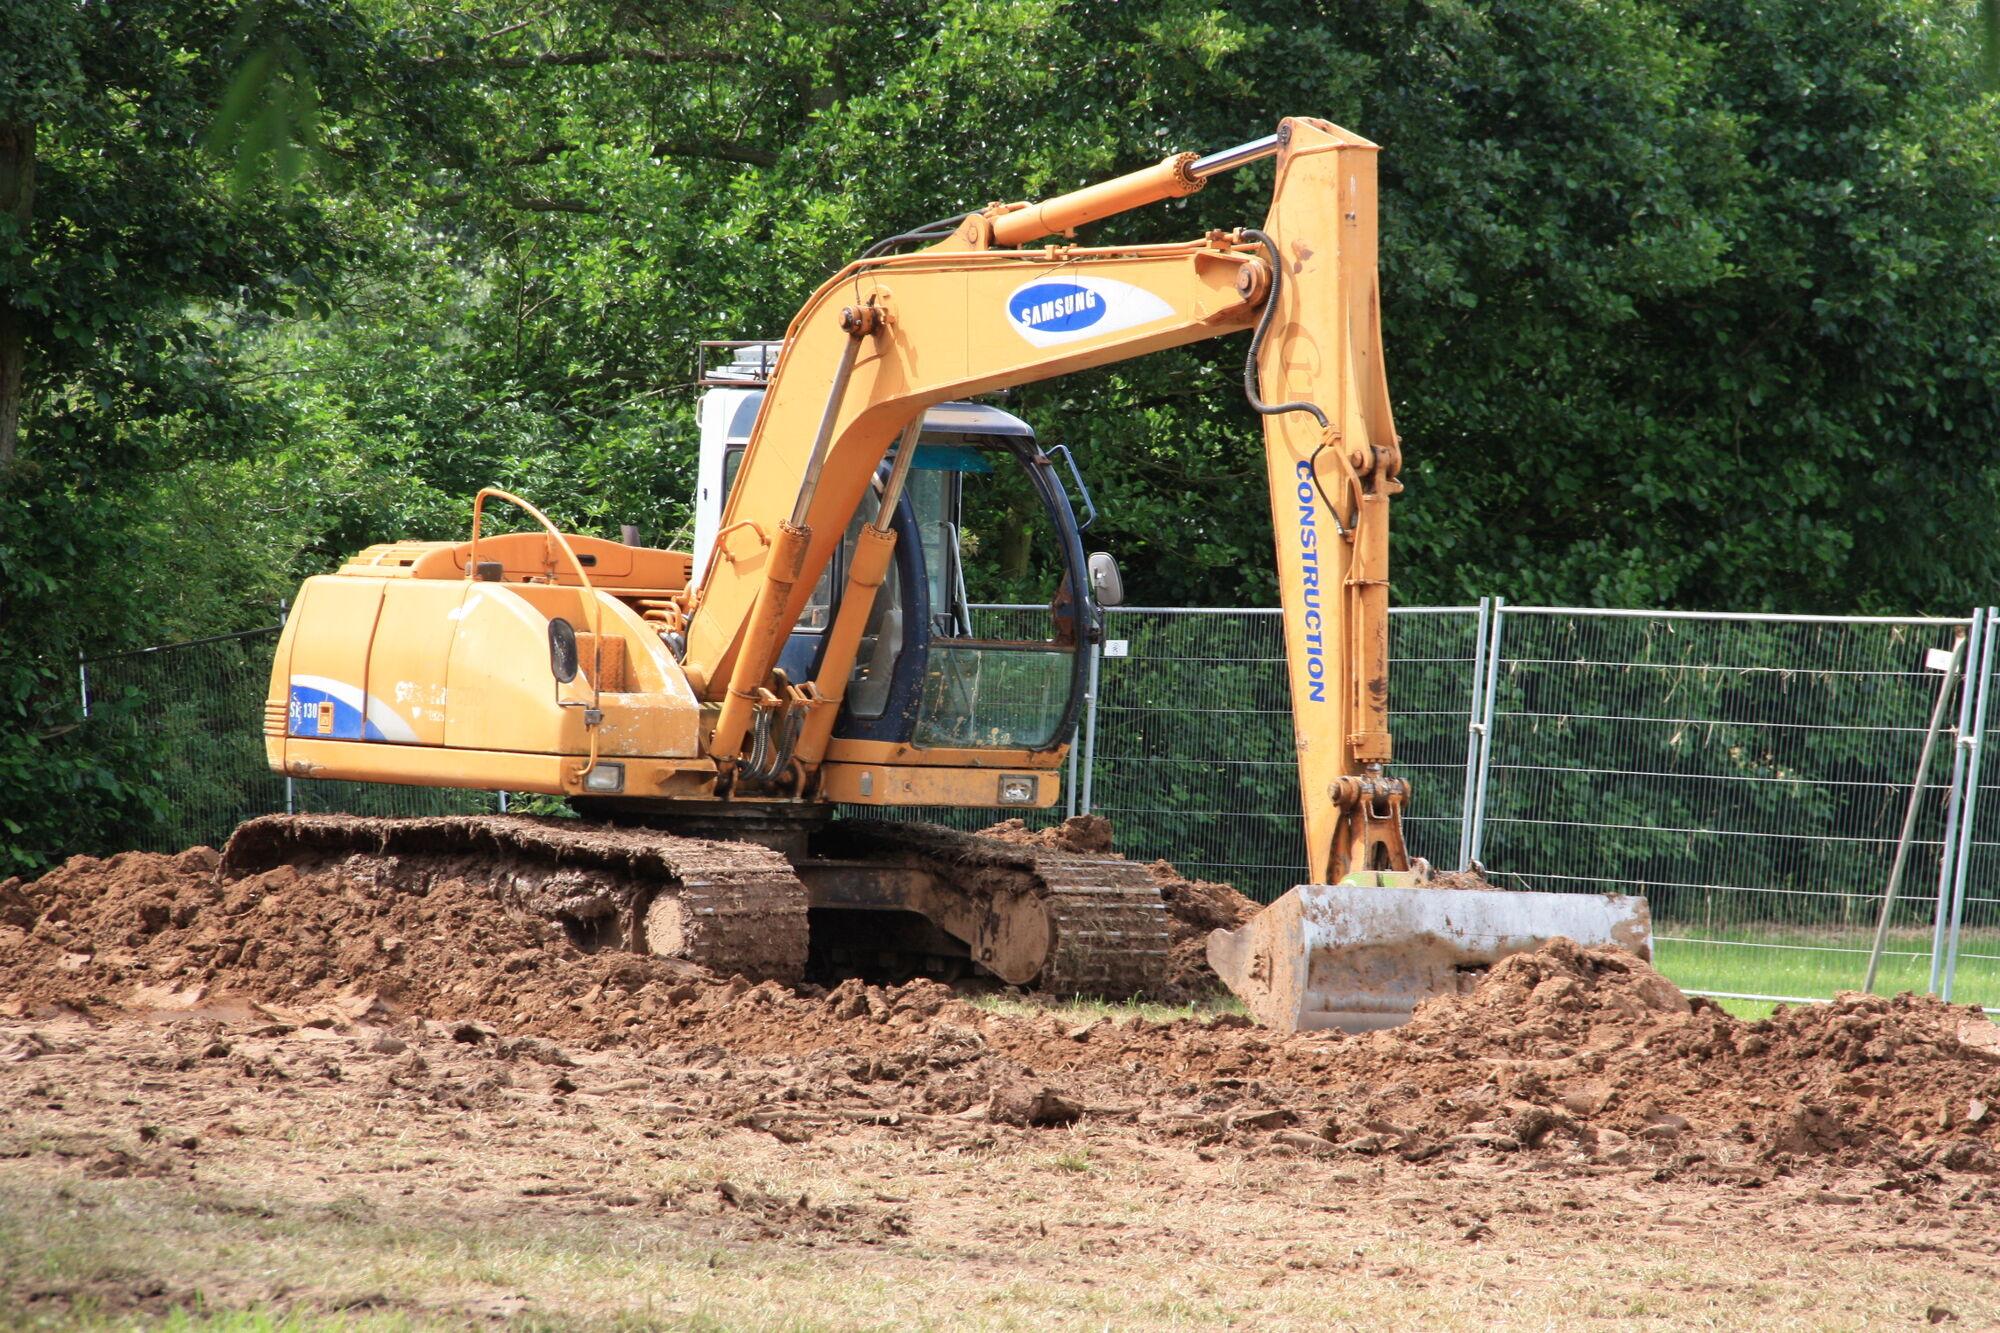 Samsung | Tractor & Construction Plant Wiki | FANDOM powered